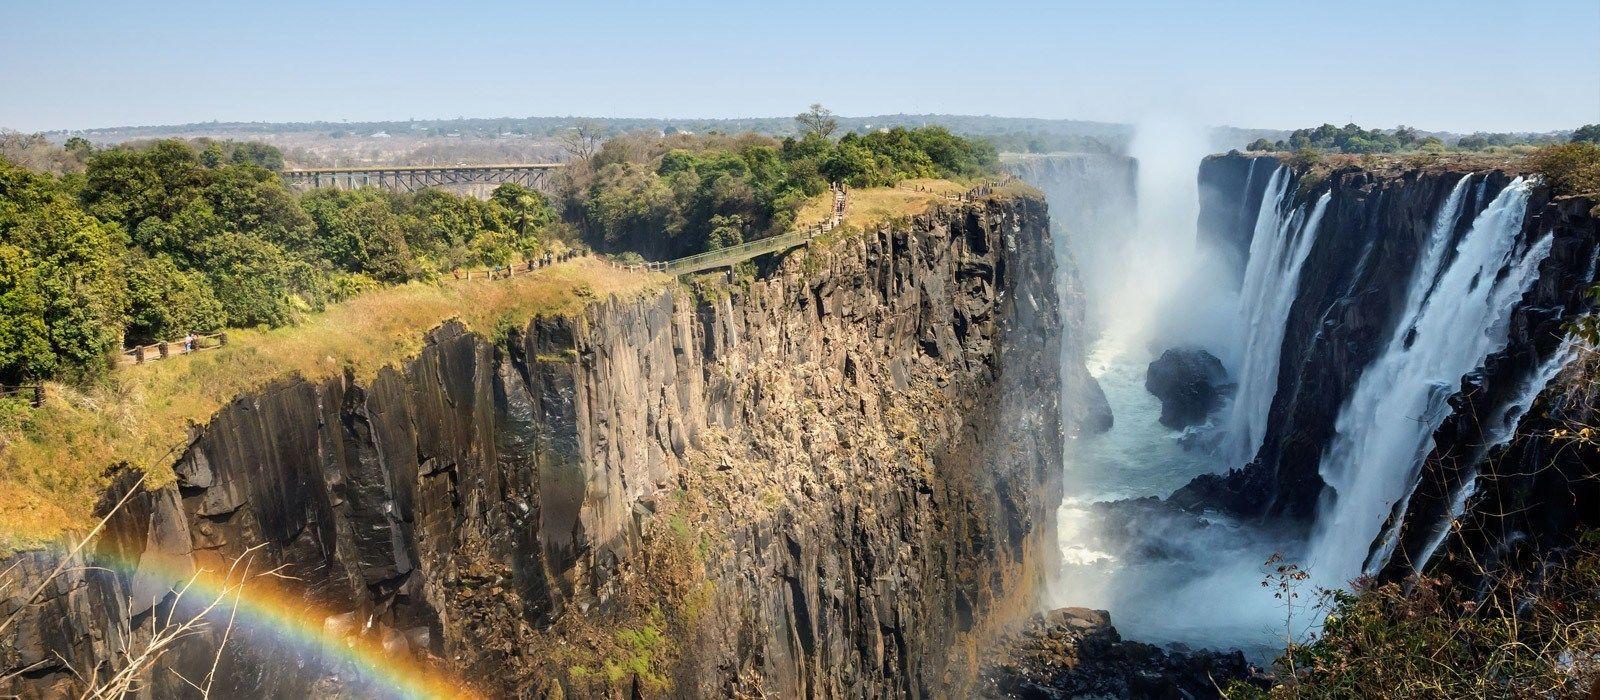 Südafrika & Sambia: Kapstadt, Krüger und Victoriafälle Urlaub 4